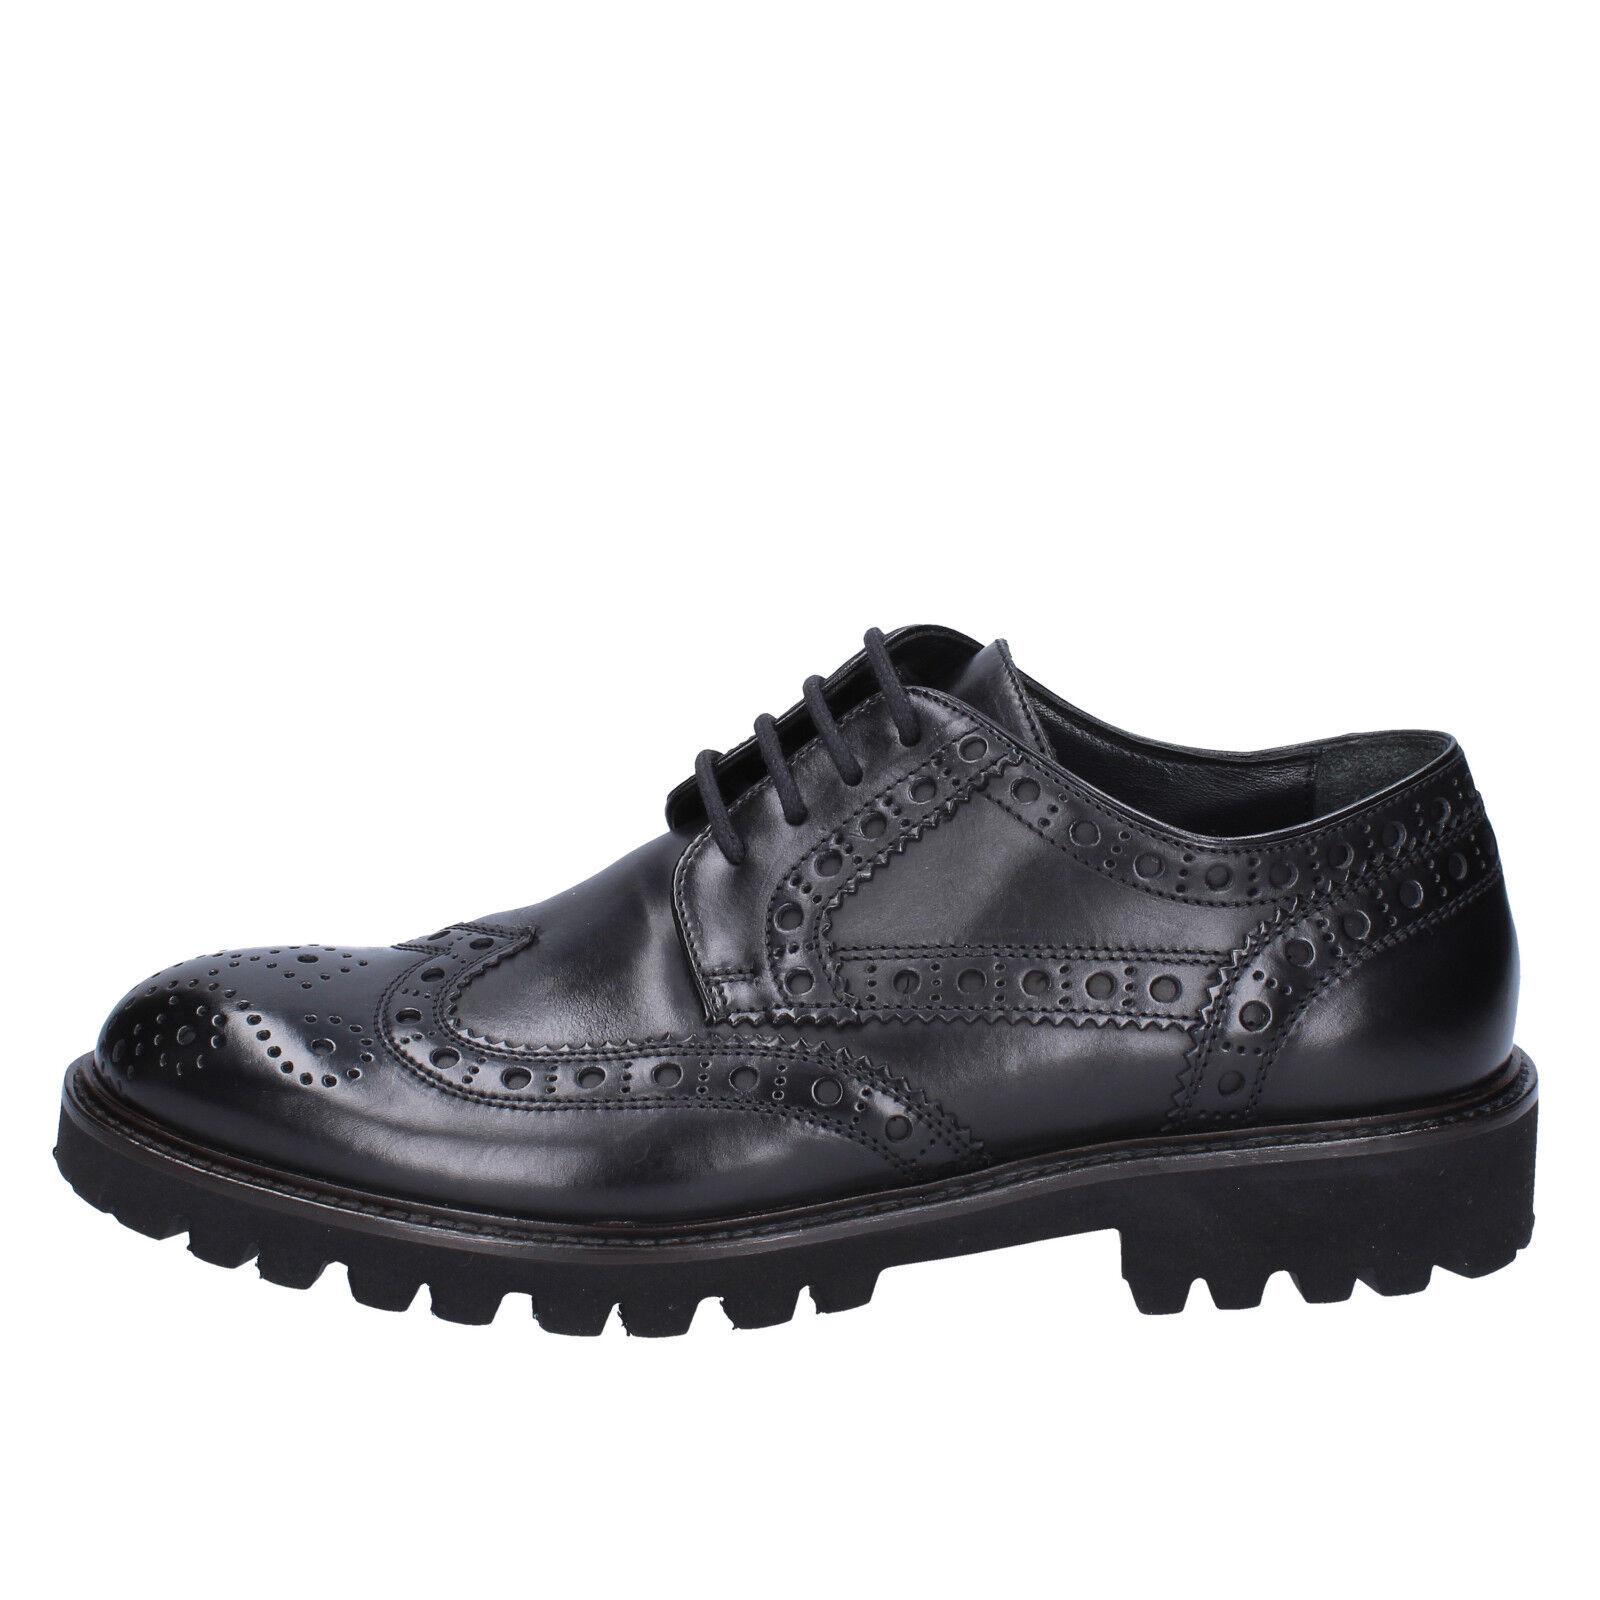 scarpe EU uomo TRIVER FLIGHT 39 EU scarpe classiche nero pelle BX569-39 14c240